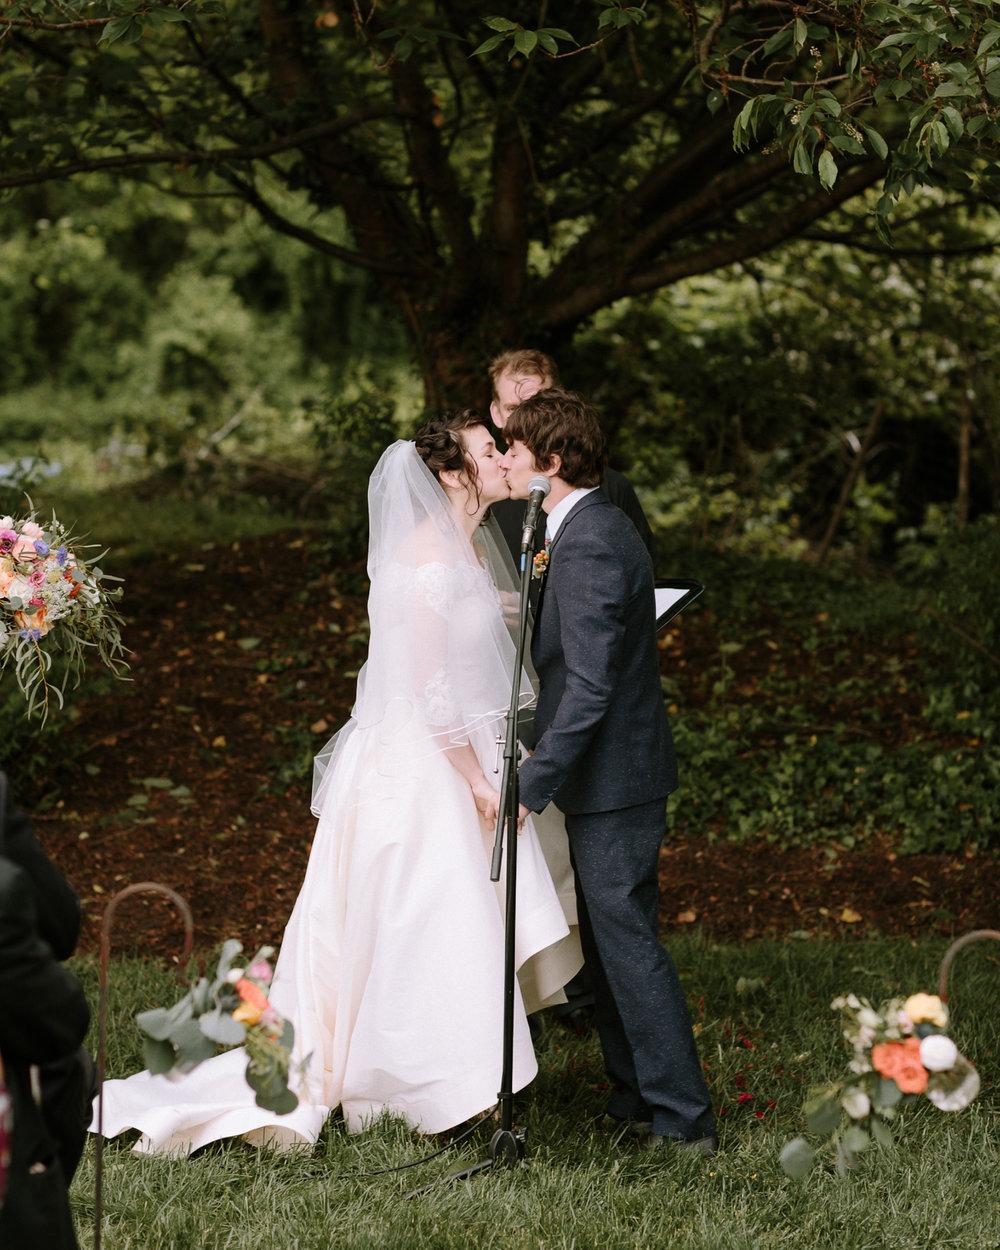 Annapolis-Maryland-Backyard-Wedding-Photographer-Hannah-Houston-49.jpg